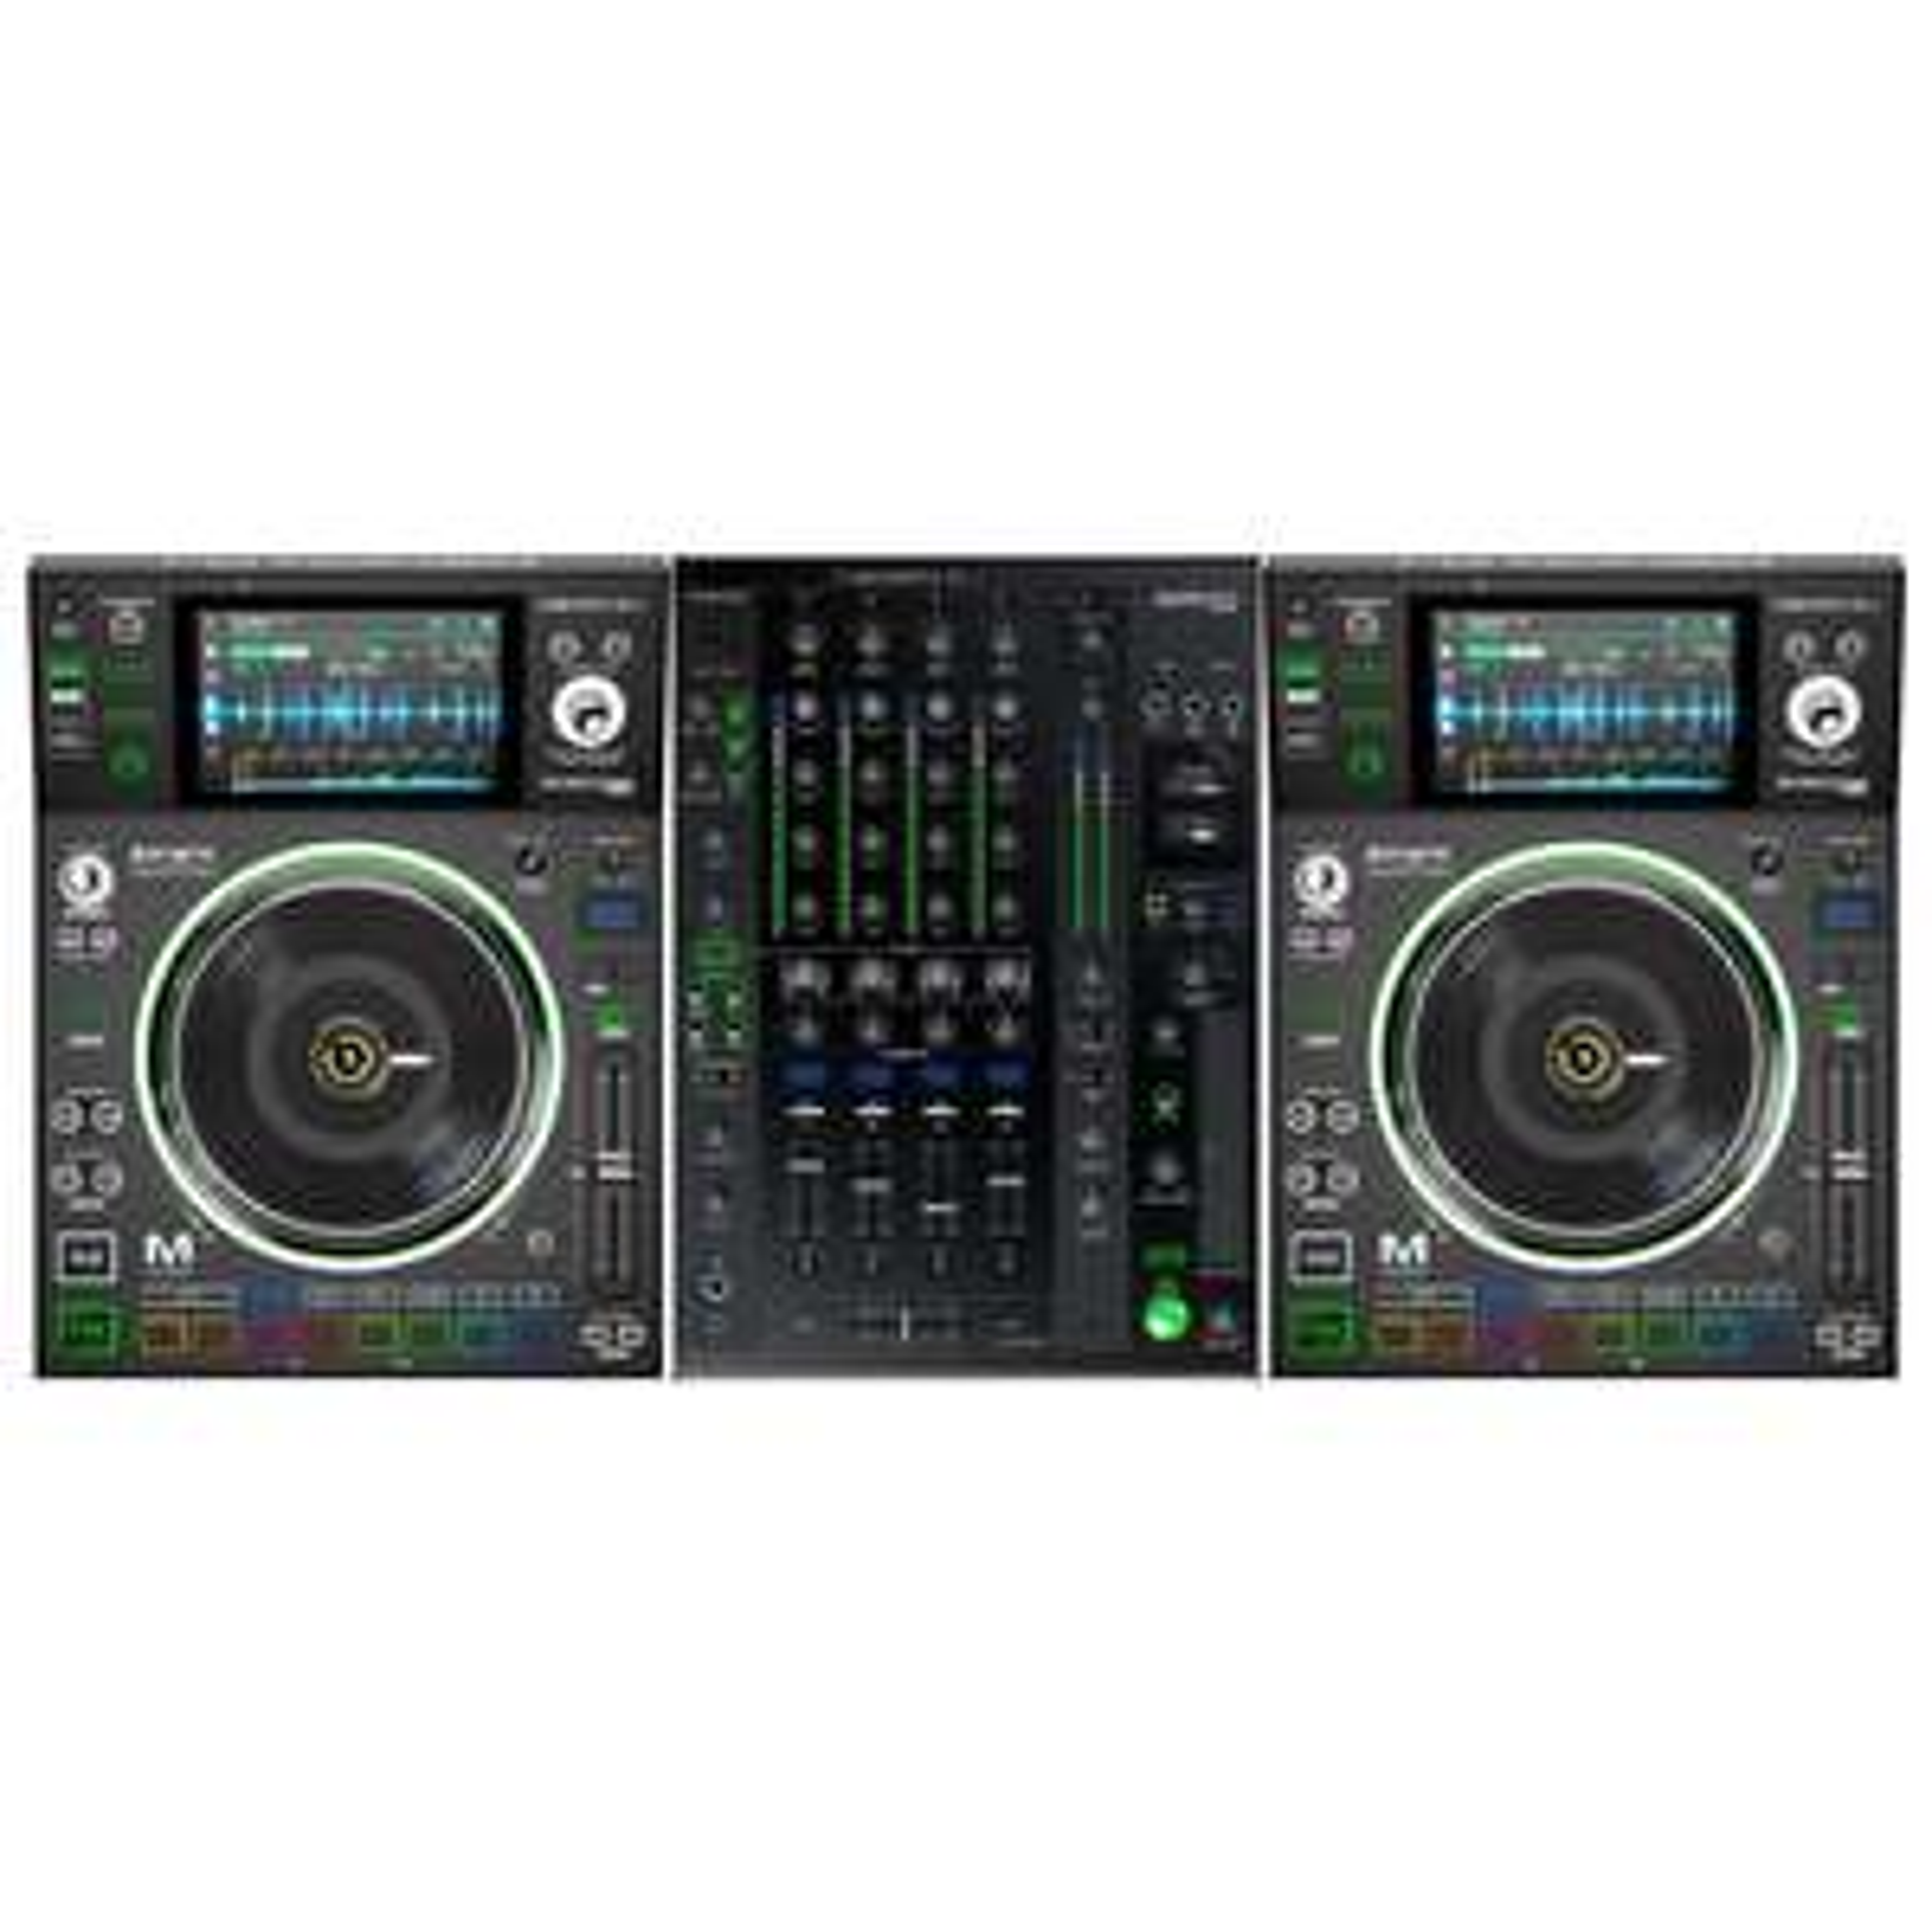 Pack 2 Platines Denon SC5000m Prime + Table de mixage Denon X1800